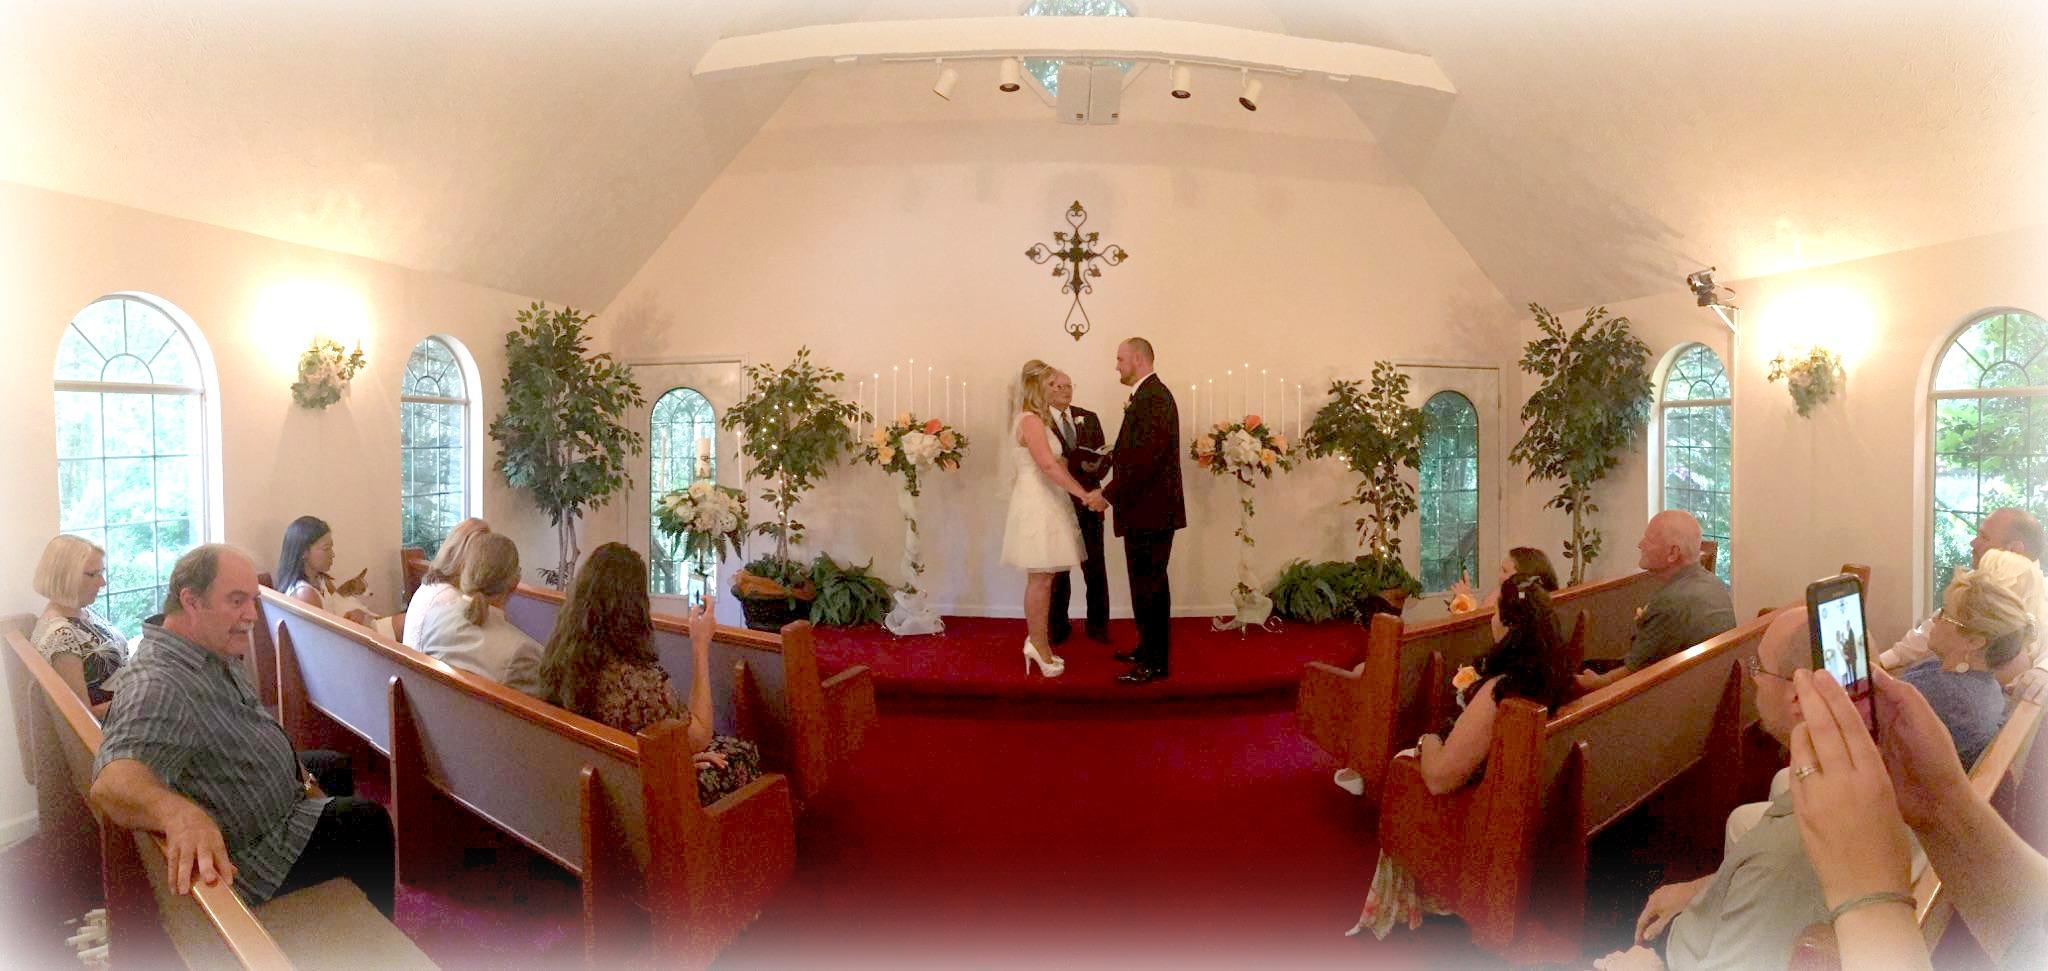 Our Beautiful Wedding Chapel